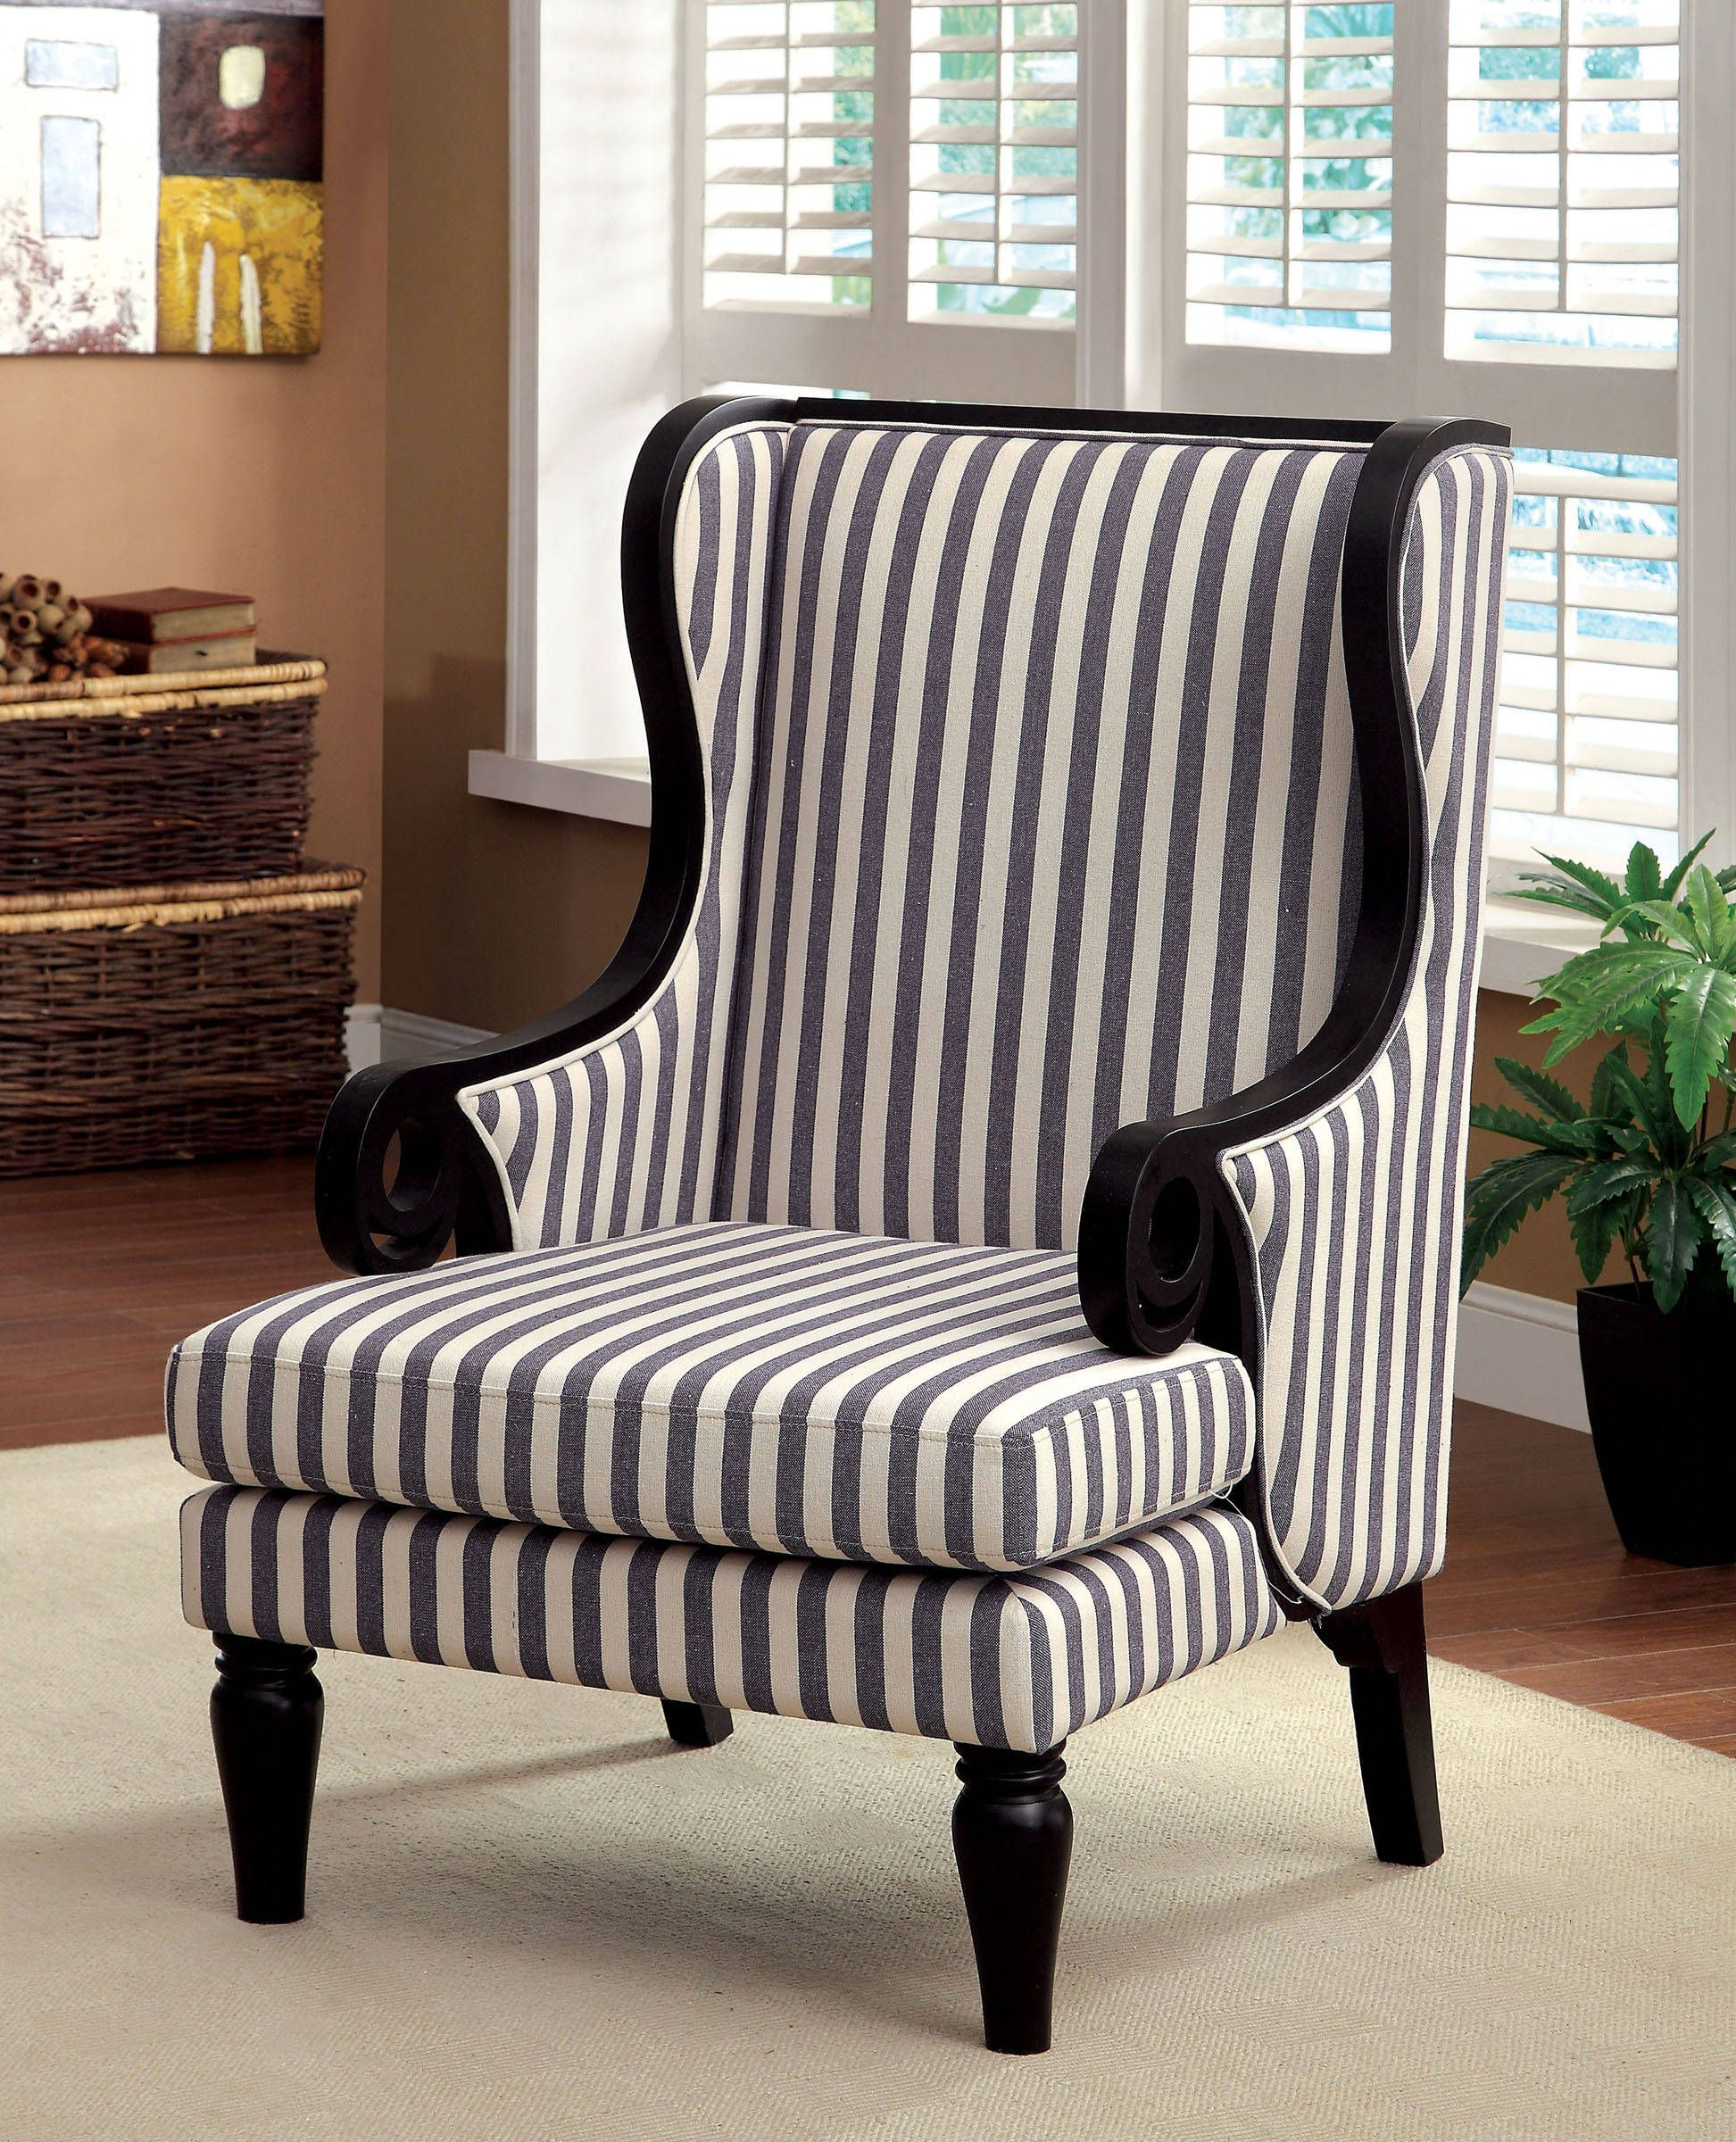 Riviera transitional white dark blue stripe fabric wood accent chair